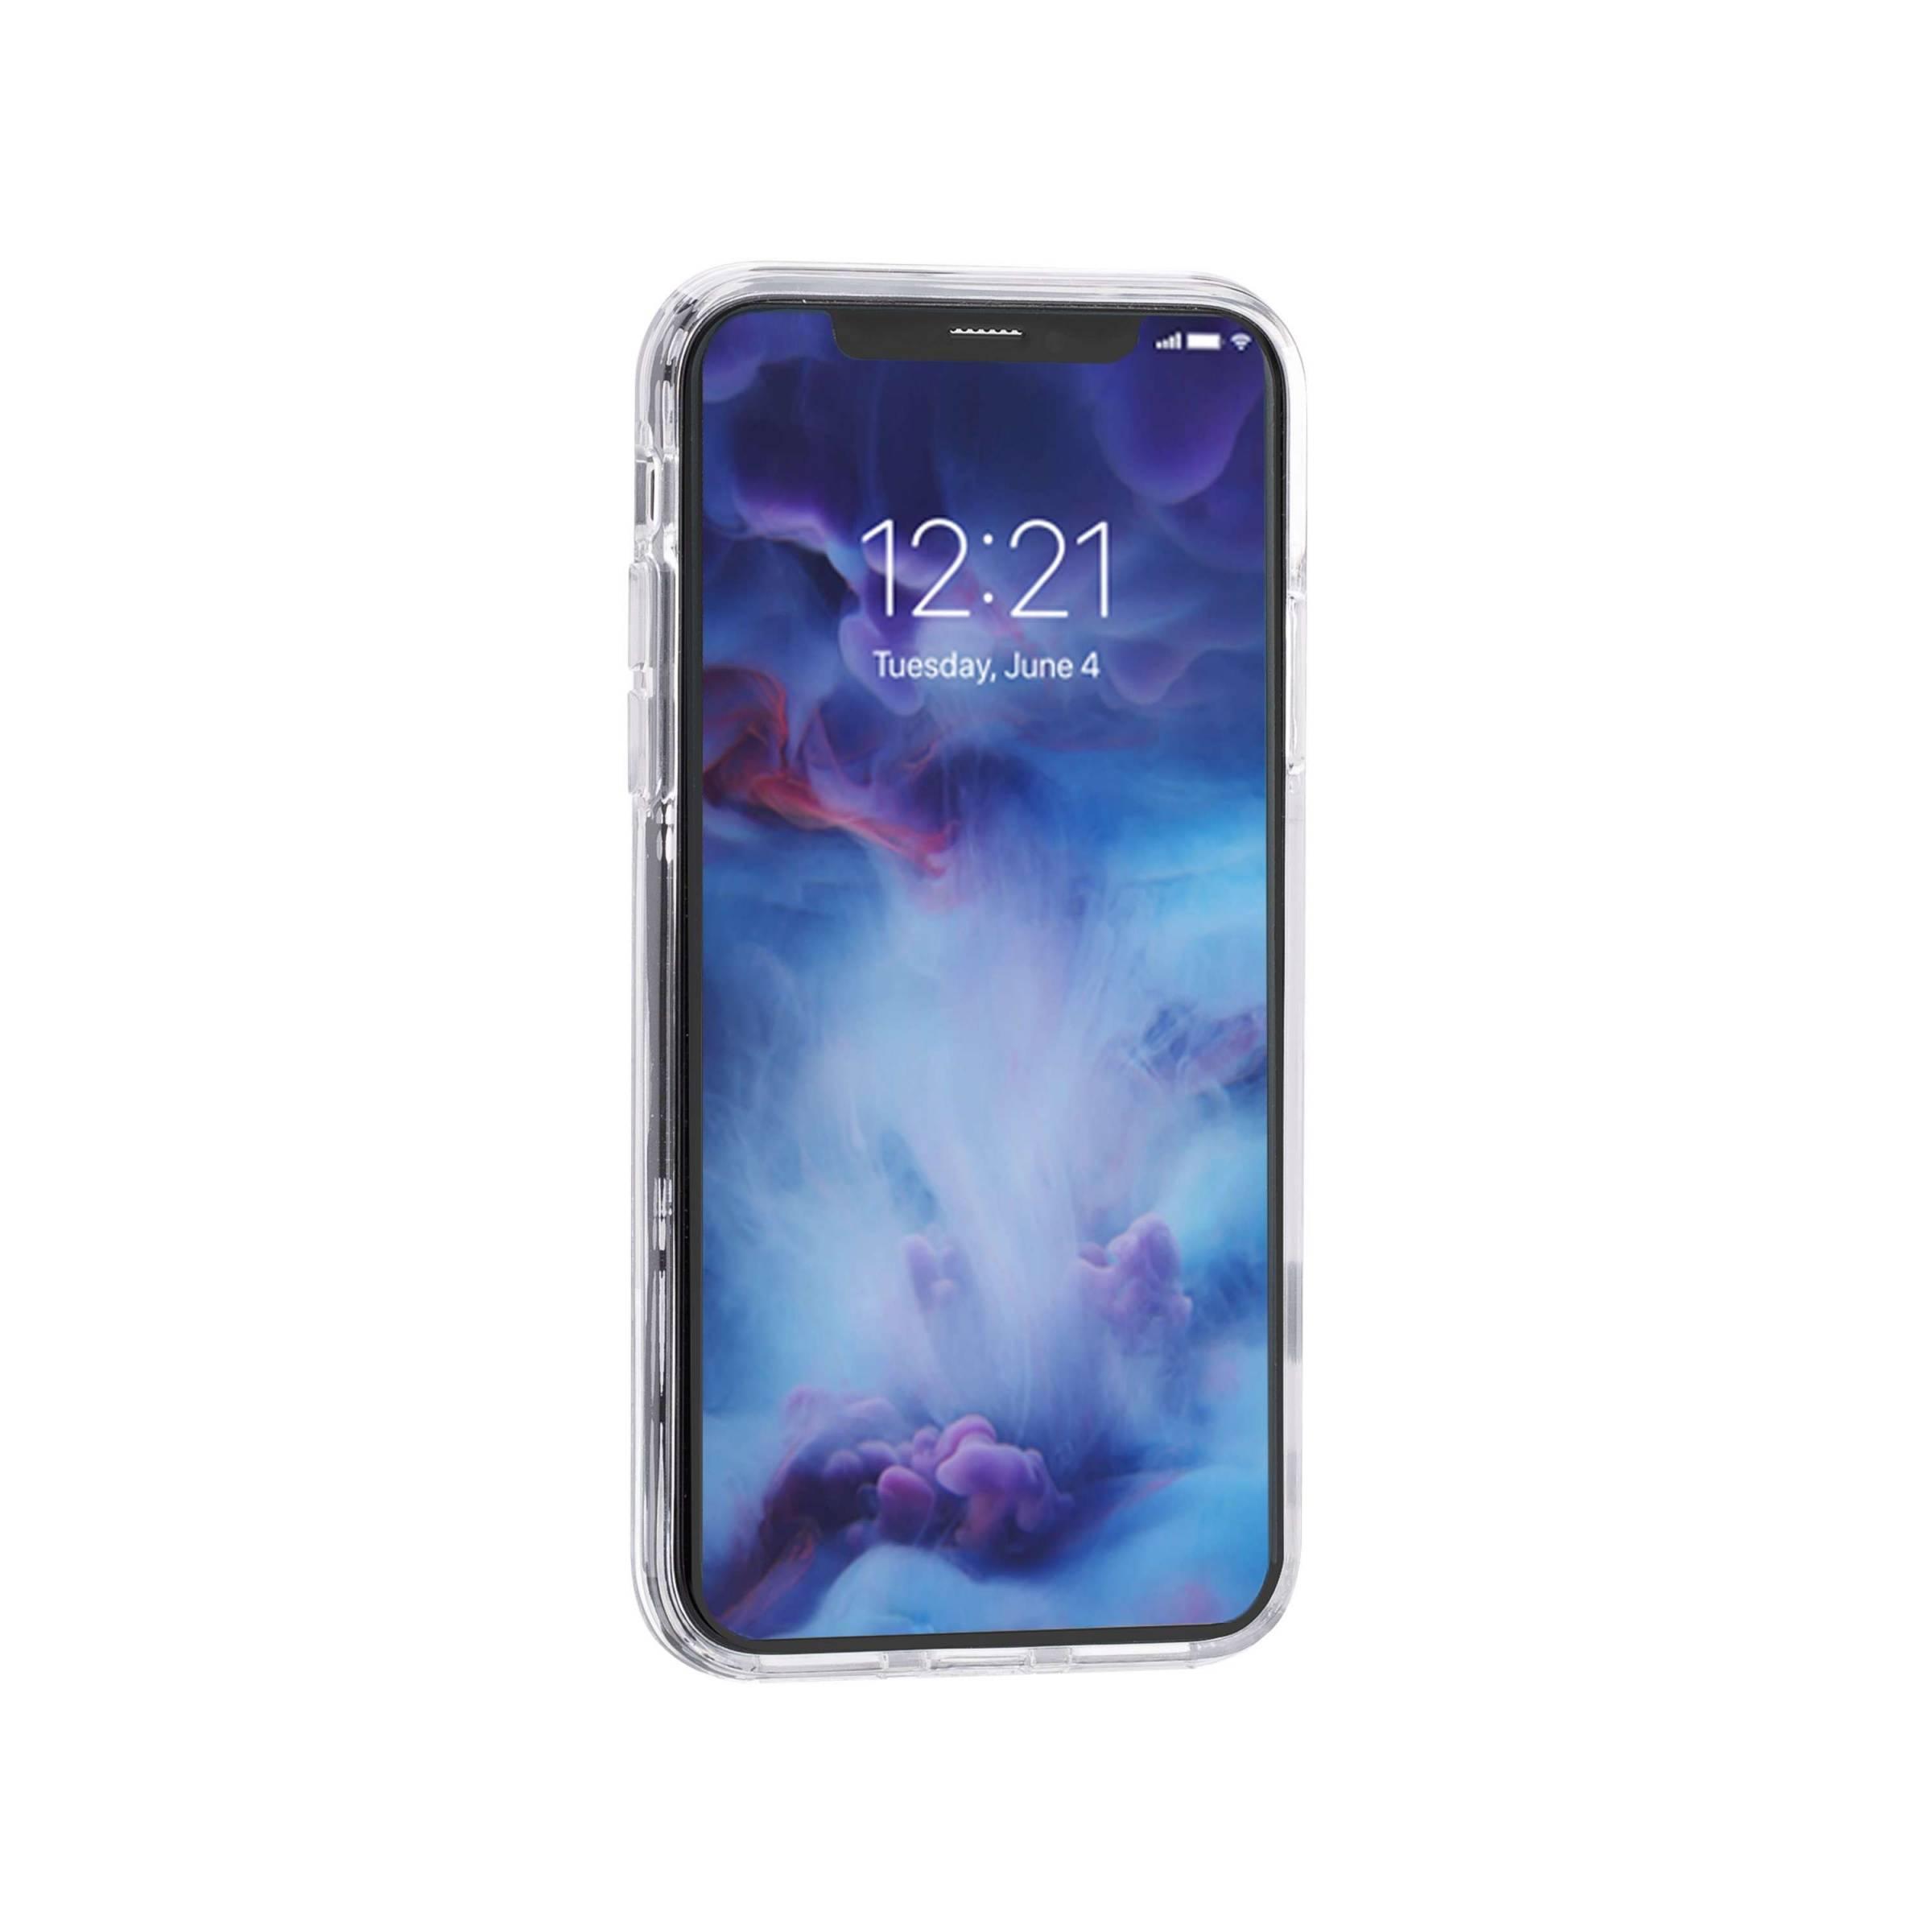 Bilde av 3sixt Iphone 11 Pure Flex 2.0 Case